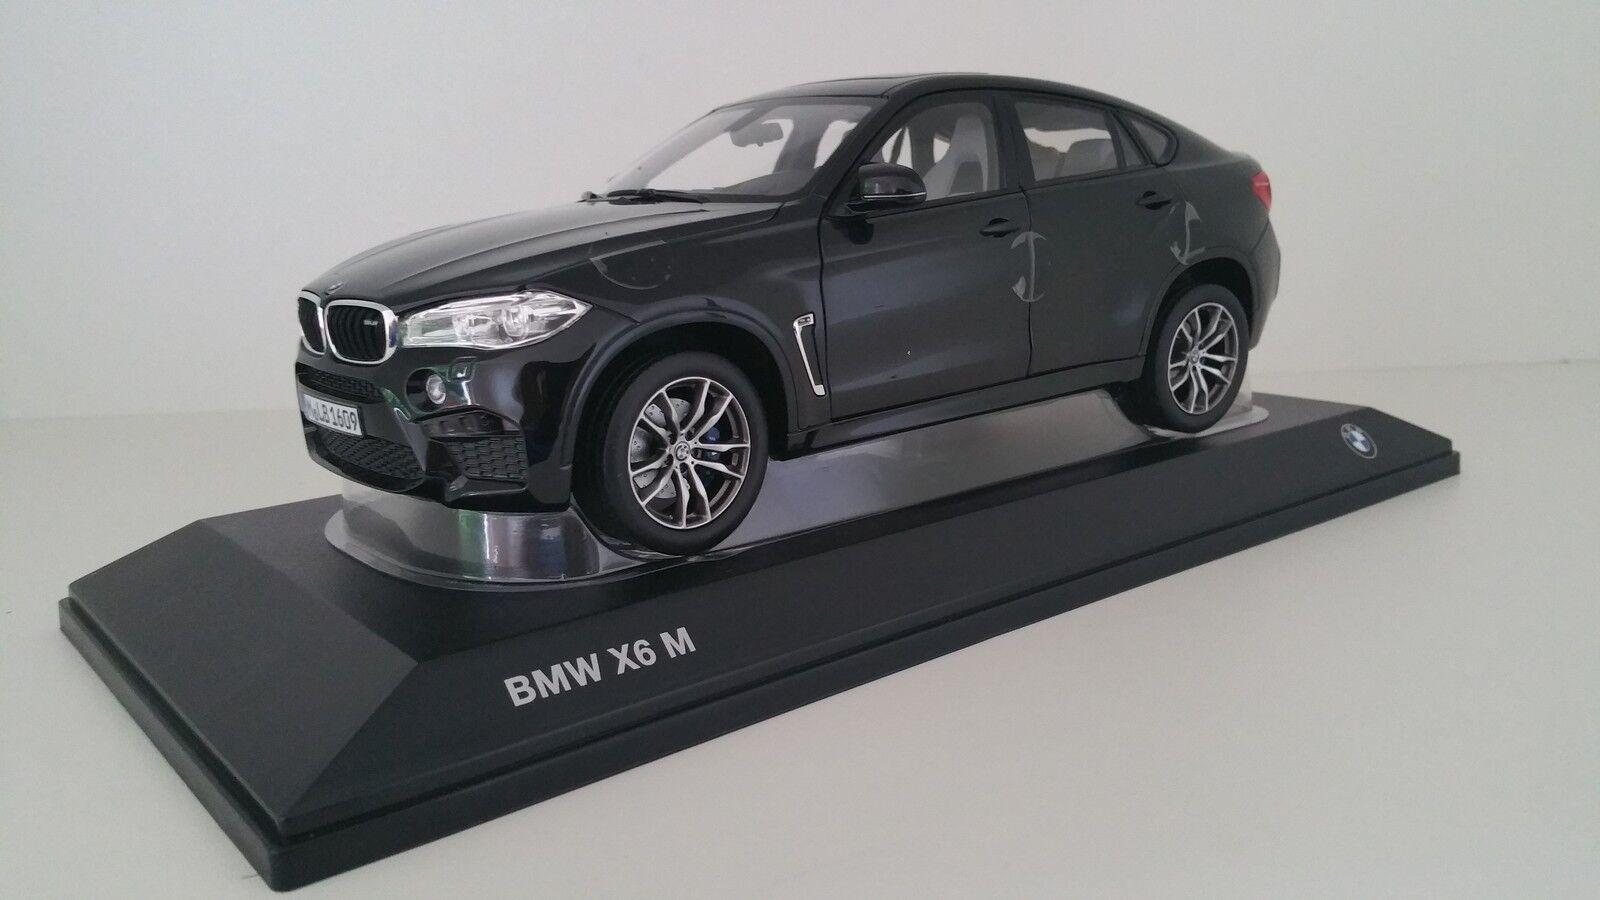 Original bmw miniatura x6m f86 sac Sapphire negro 1 18 norev 80432364887 nuevo